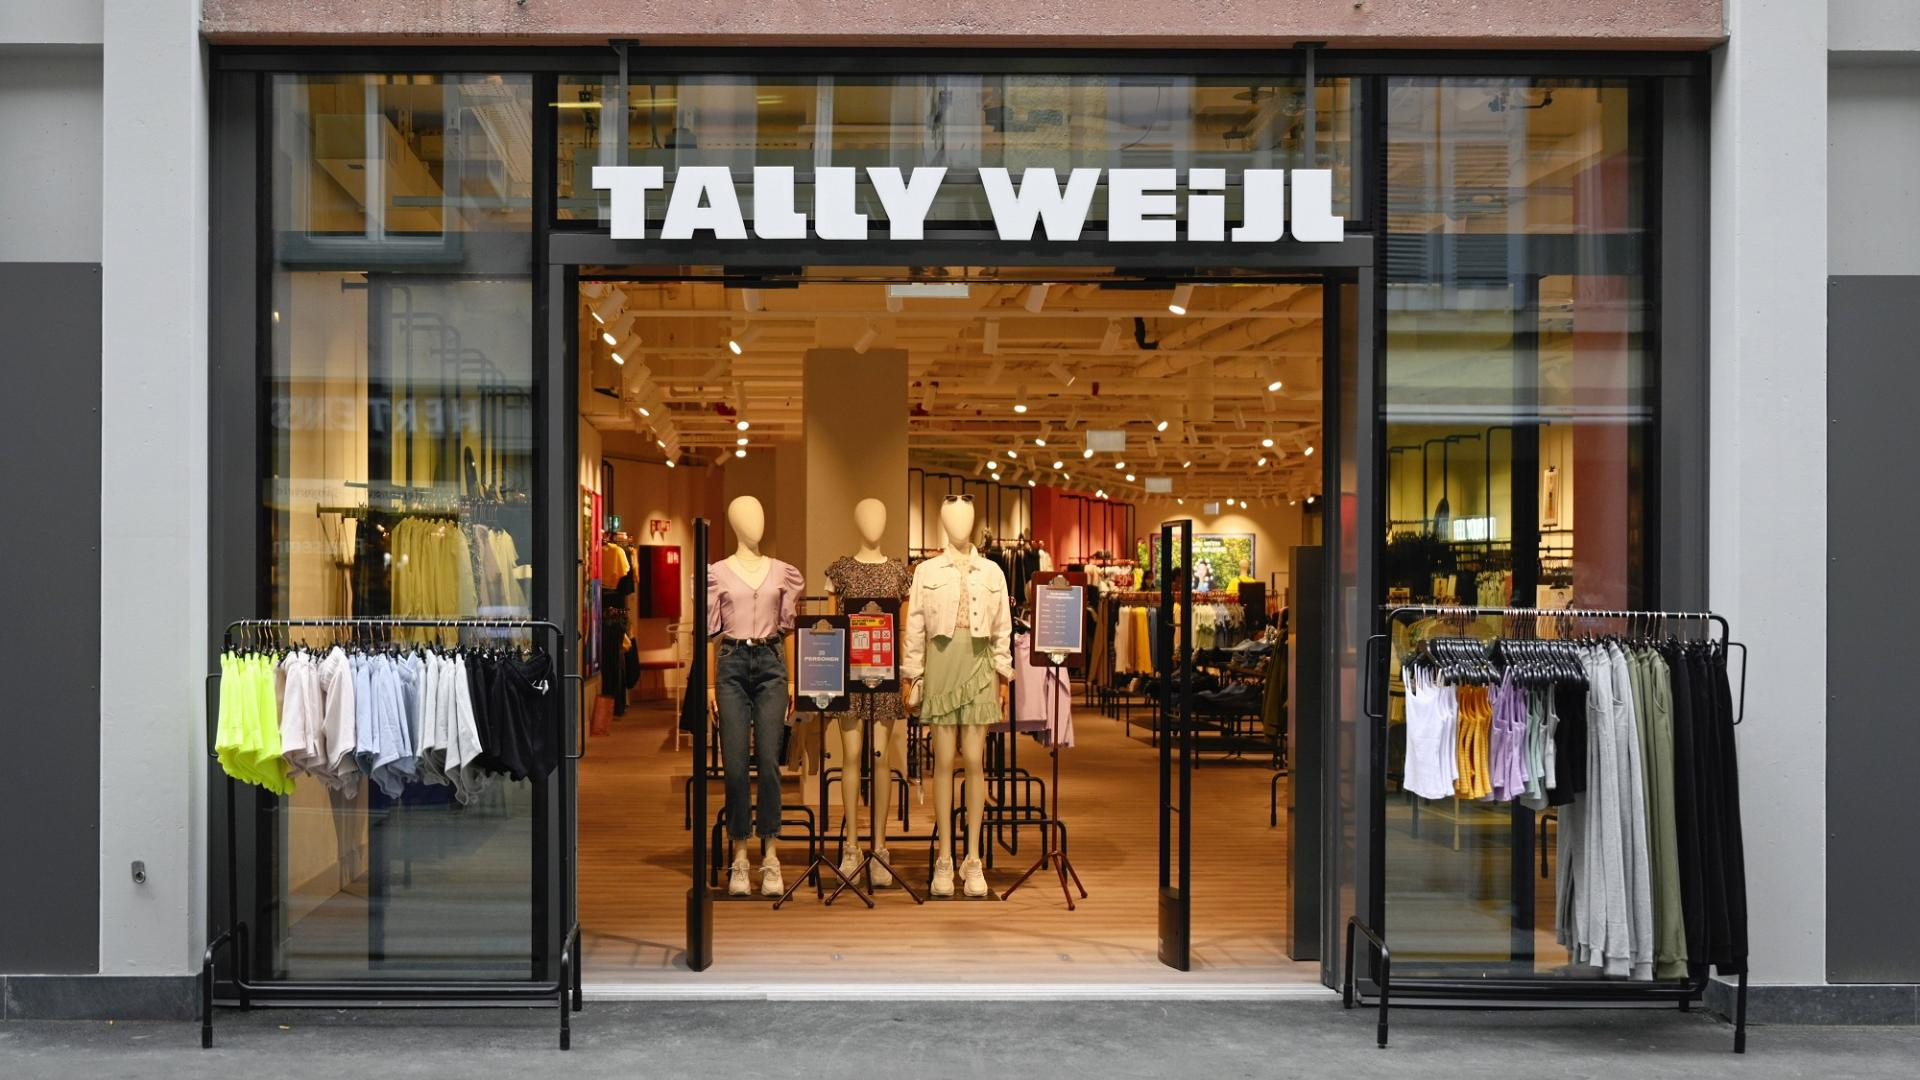 Tally Weijl Corona schließung modekonzern